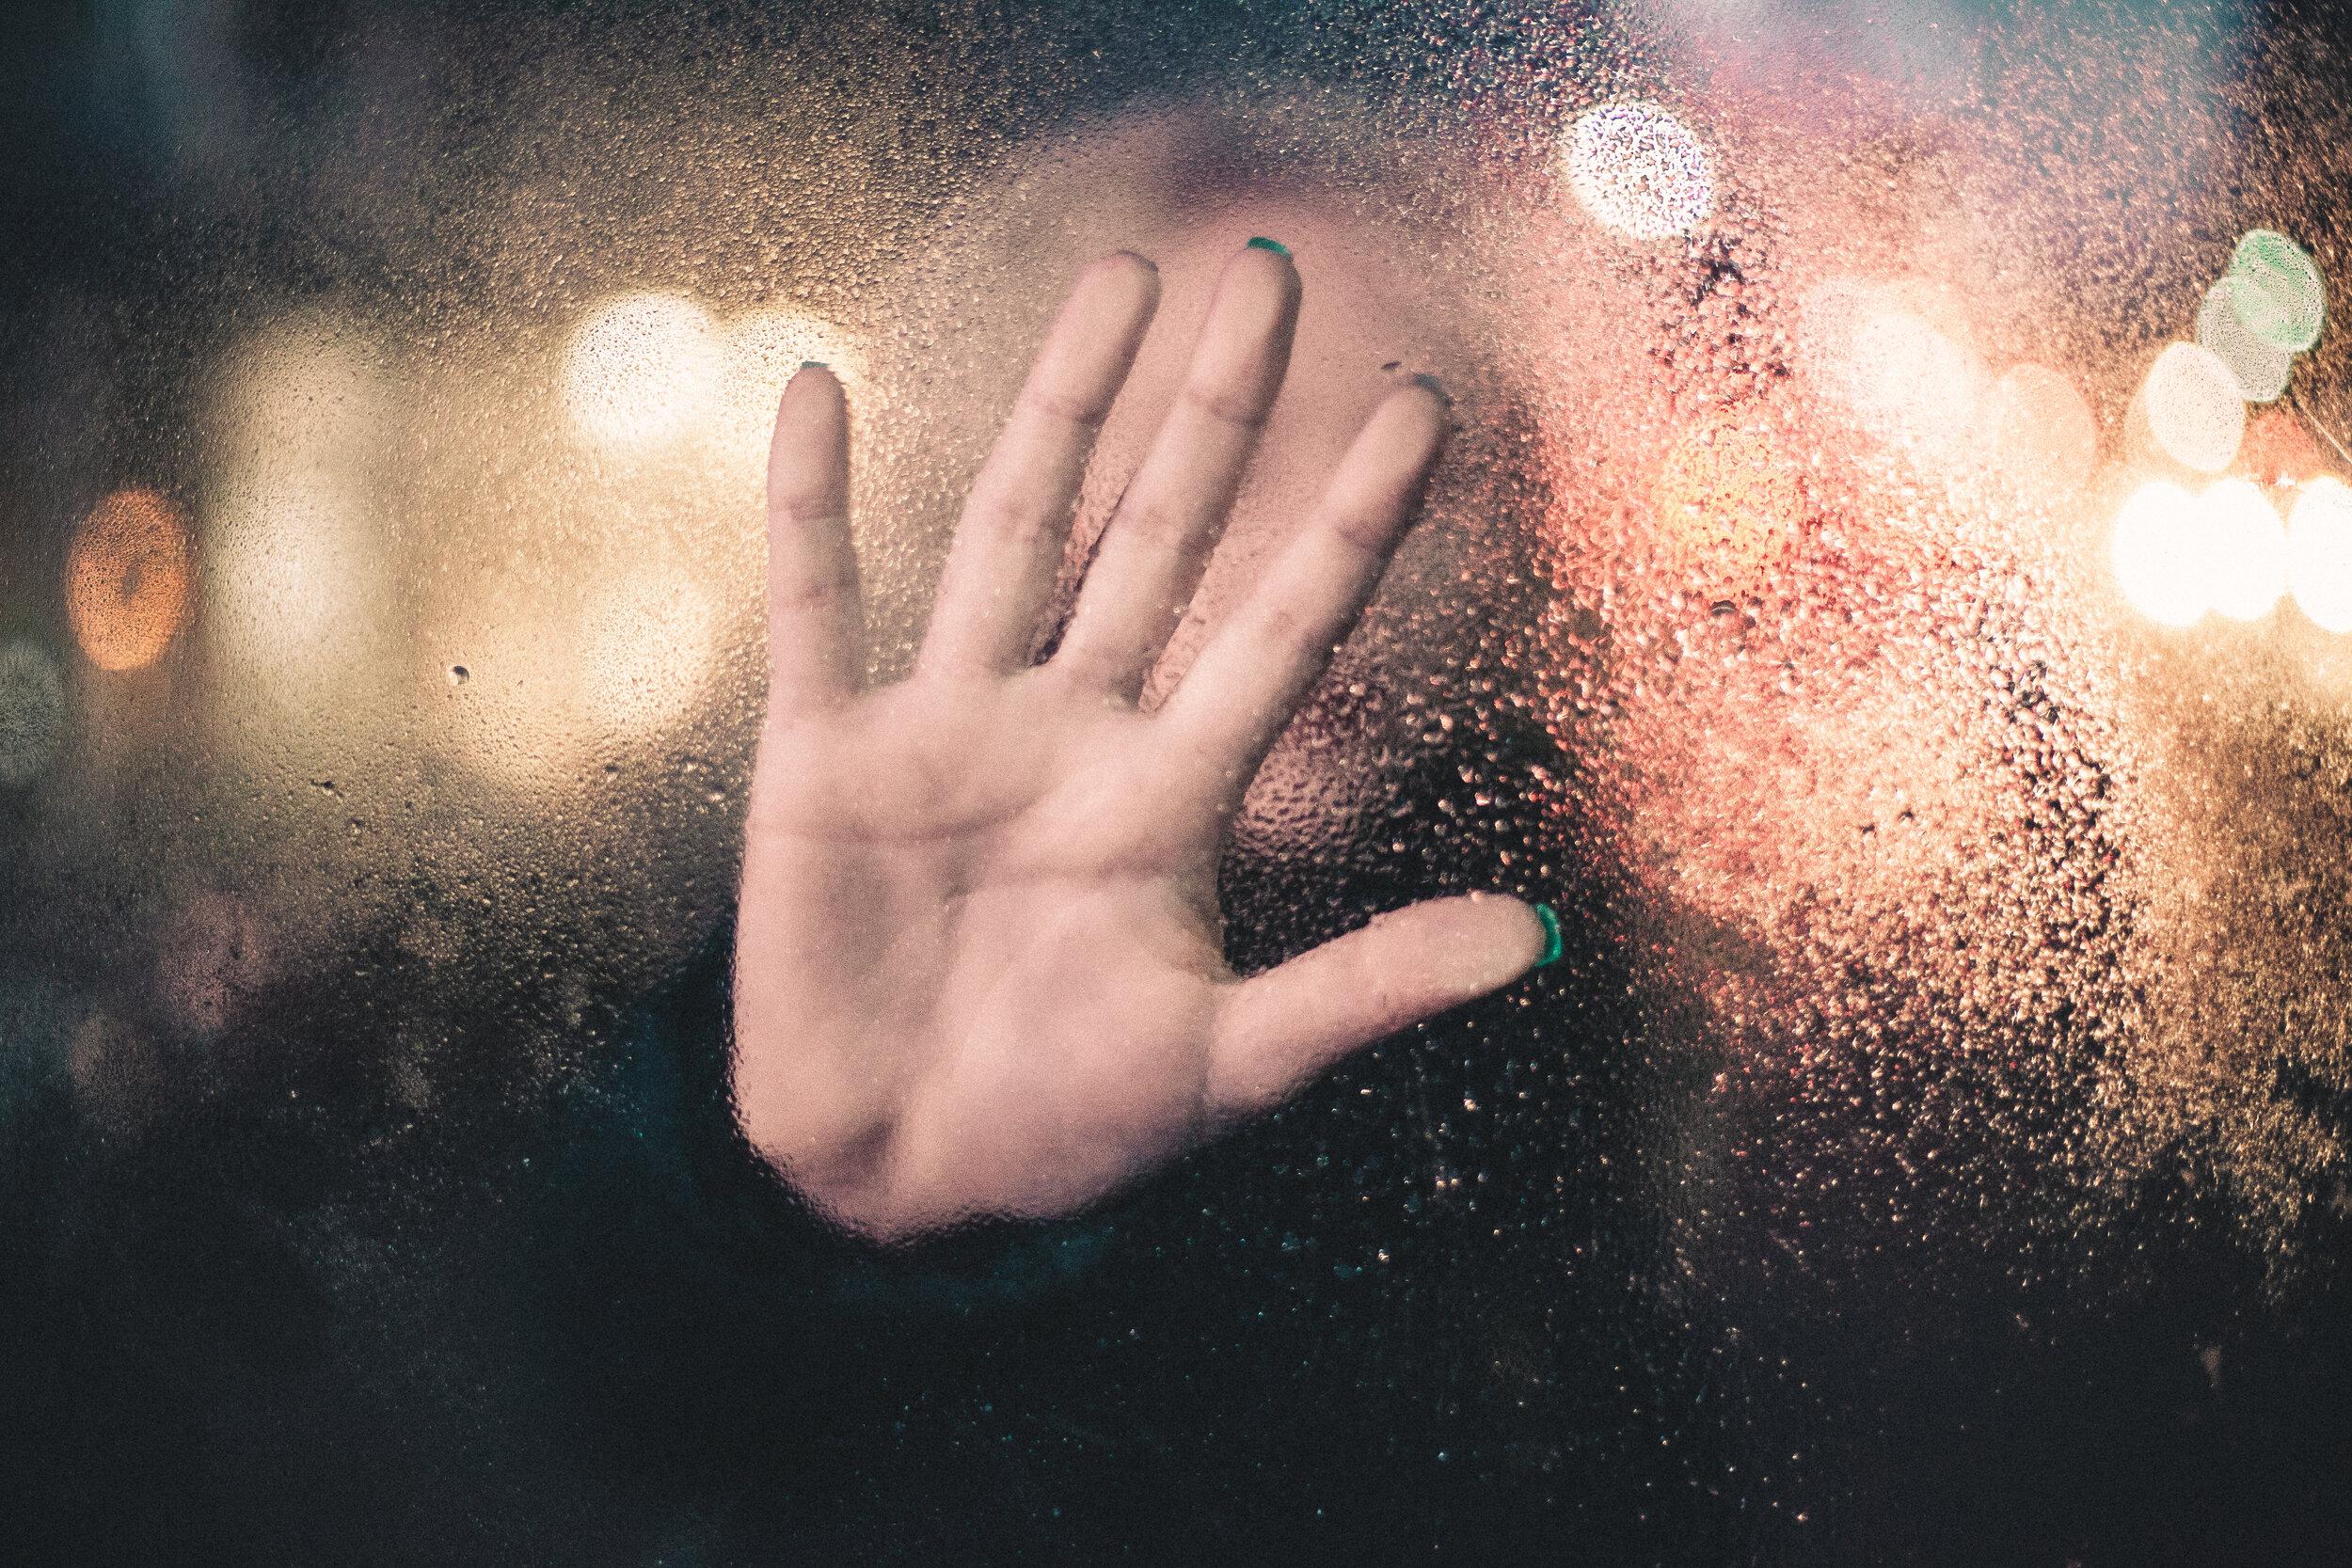 "When ""Reaching Out"" is Harmful - Reassurance Seeking Part II"